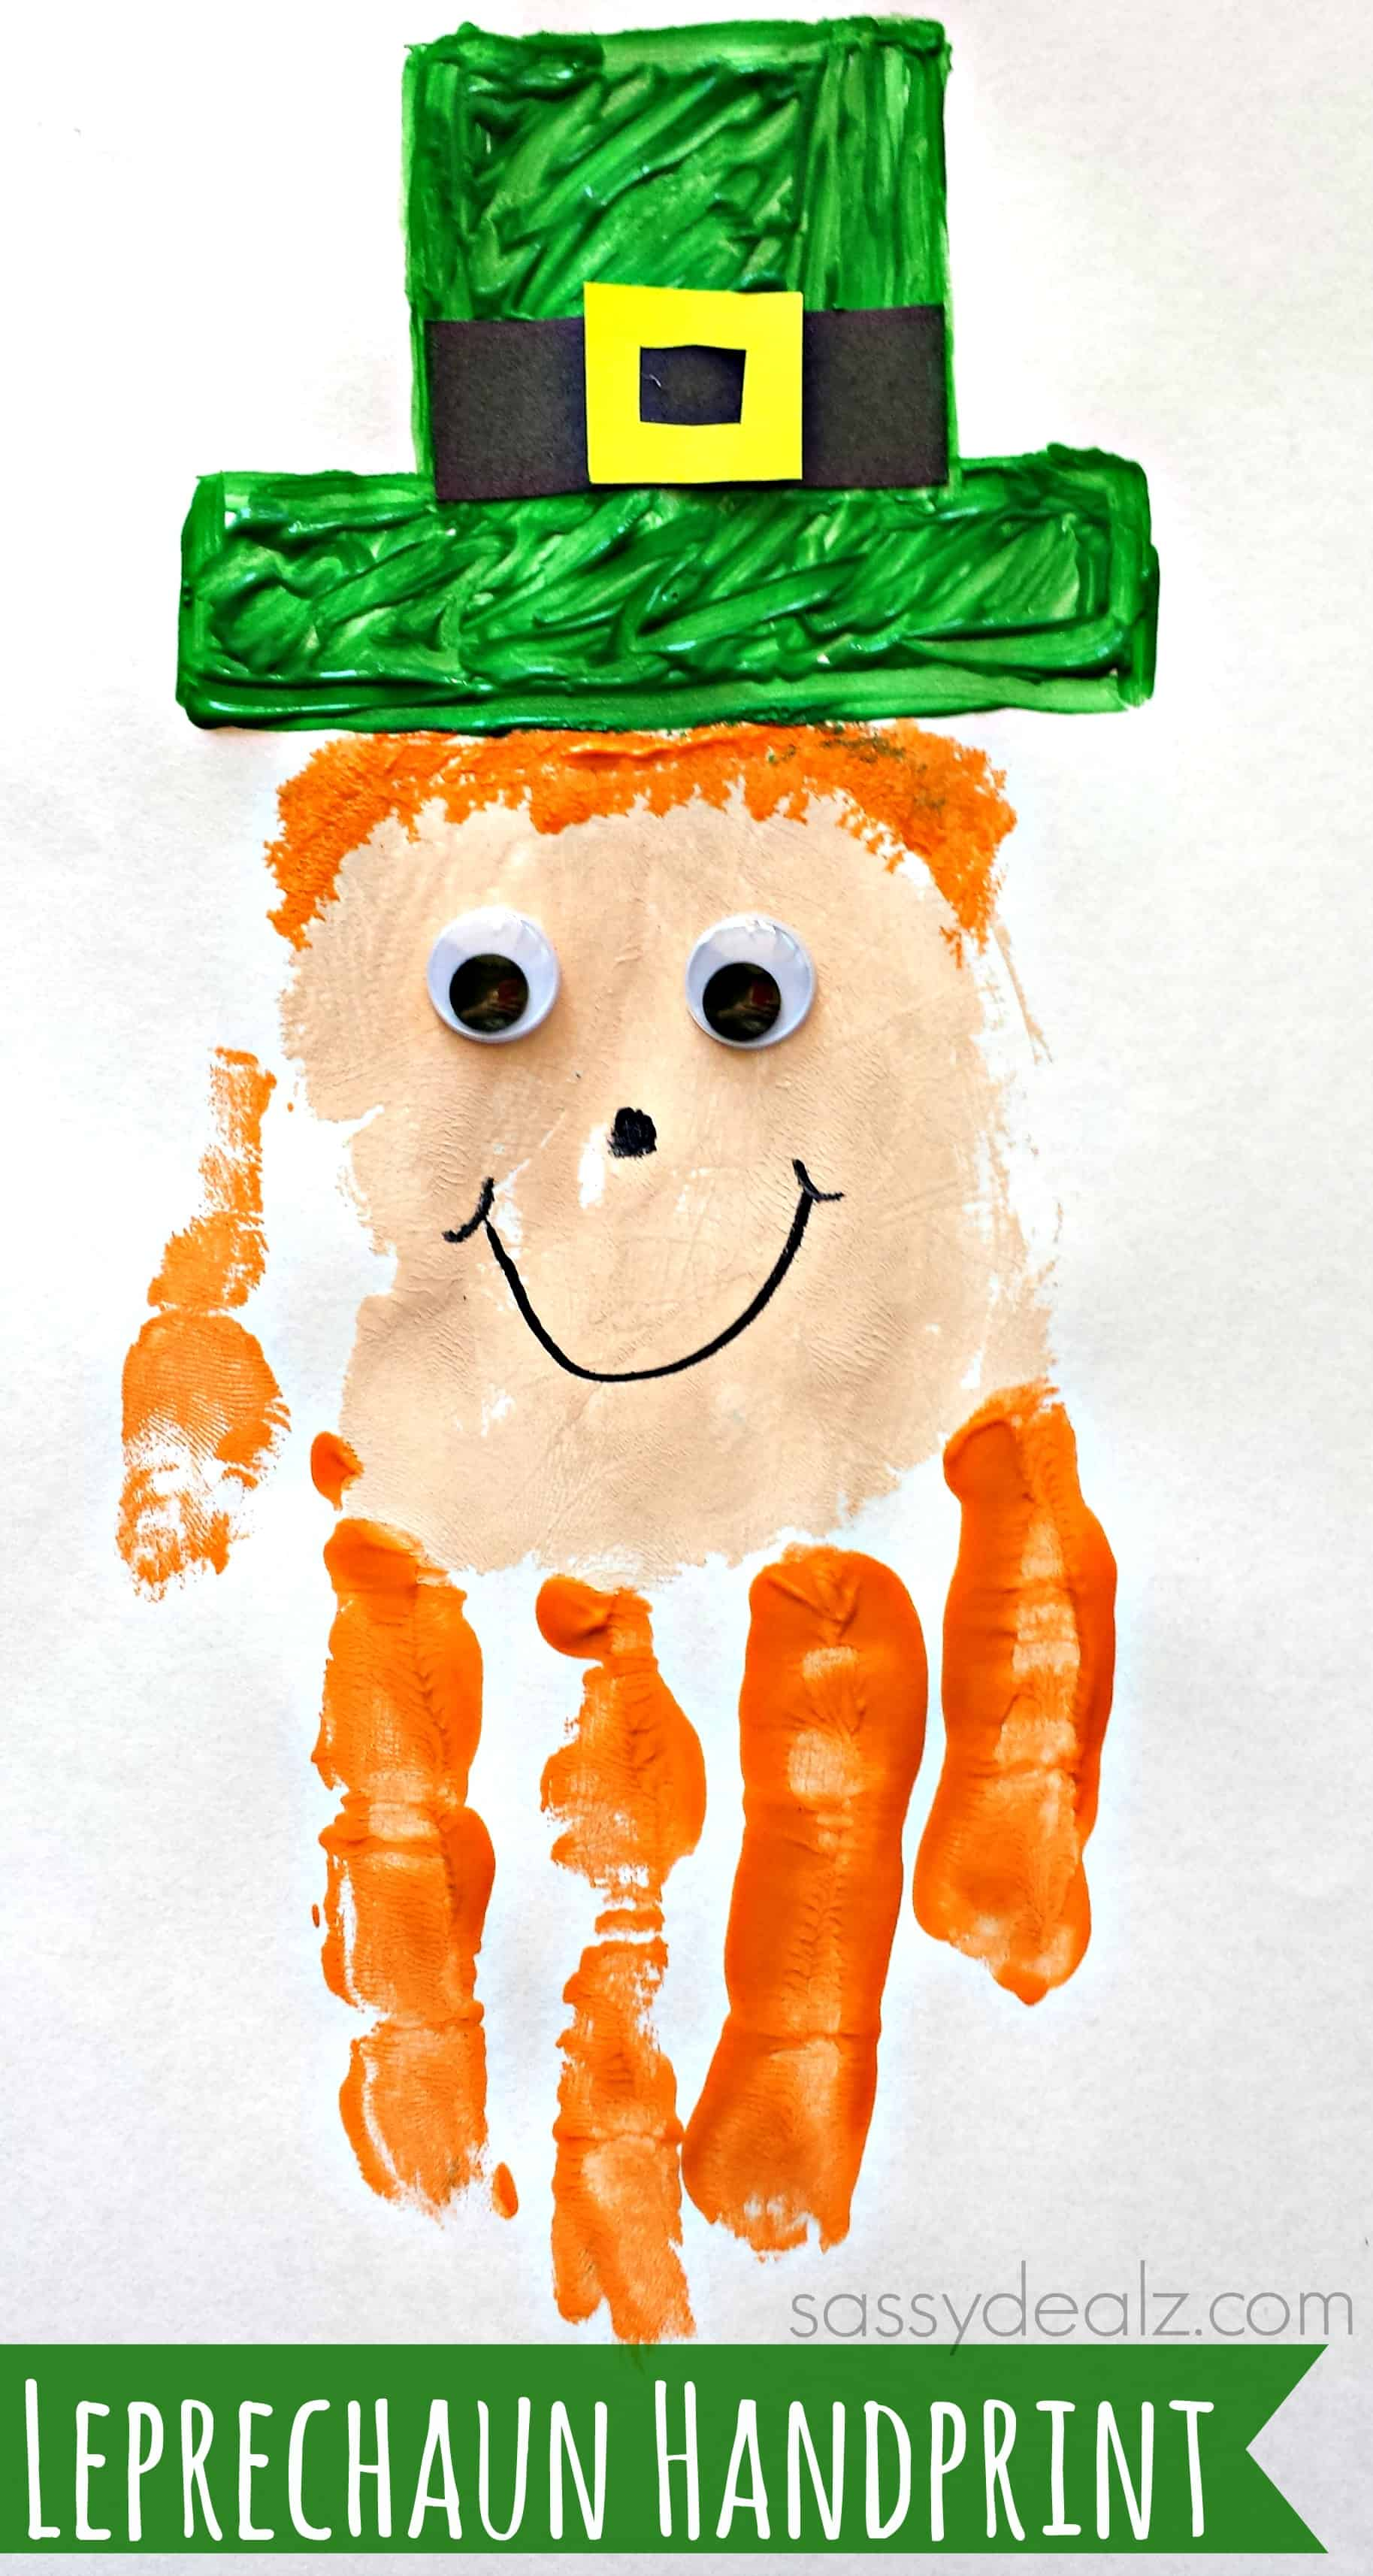 Leprechaun handprint painting